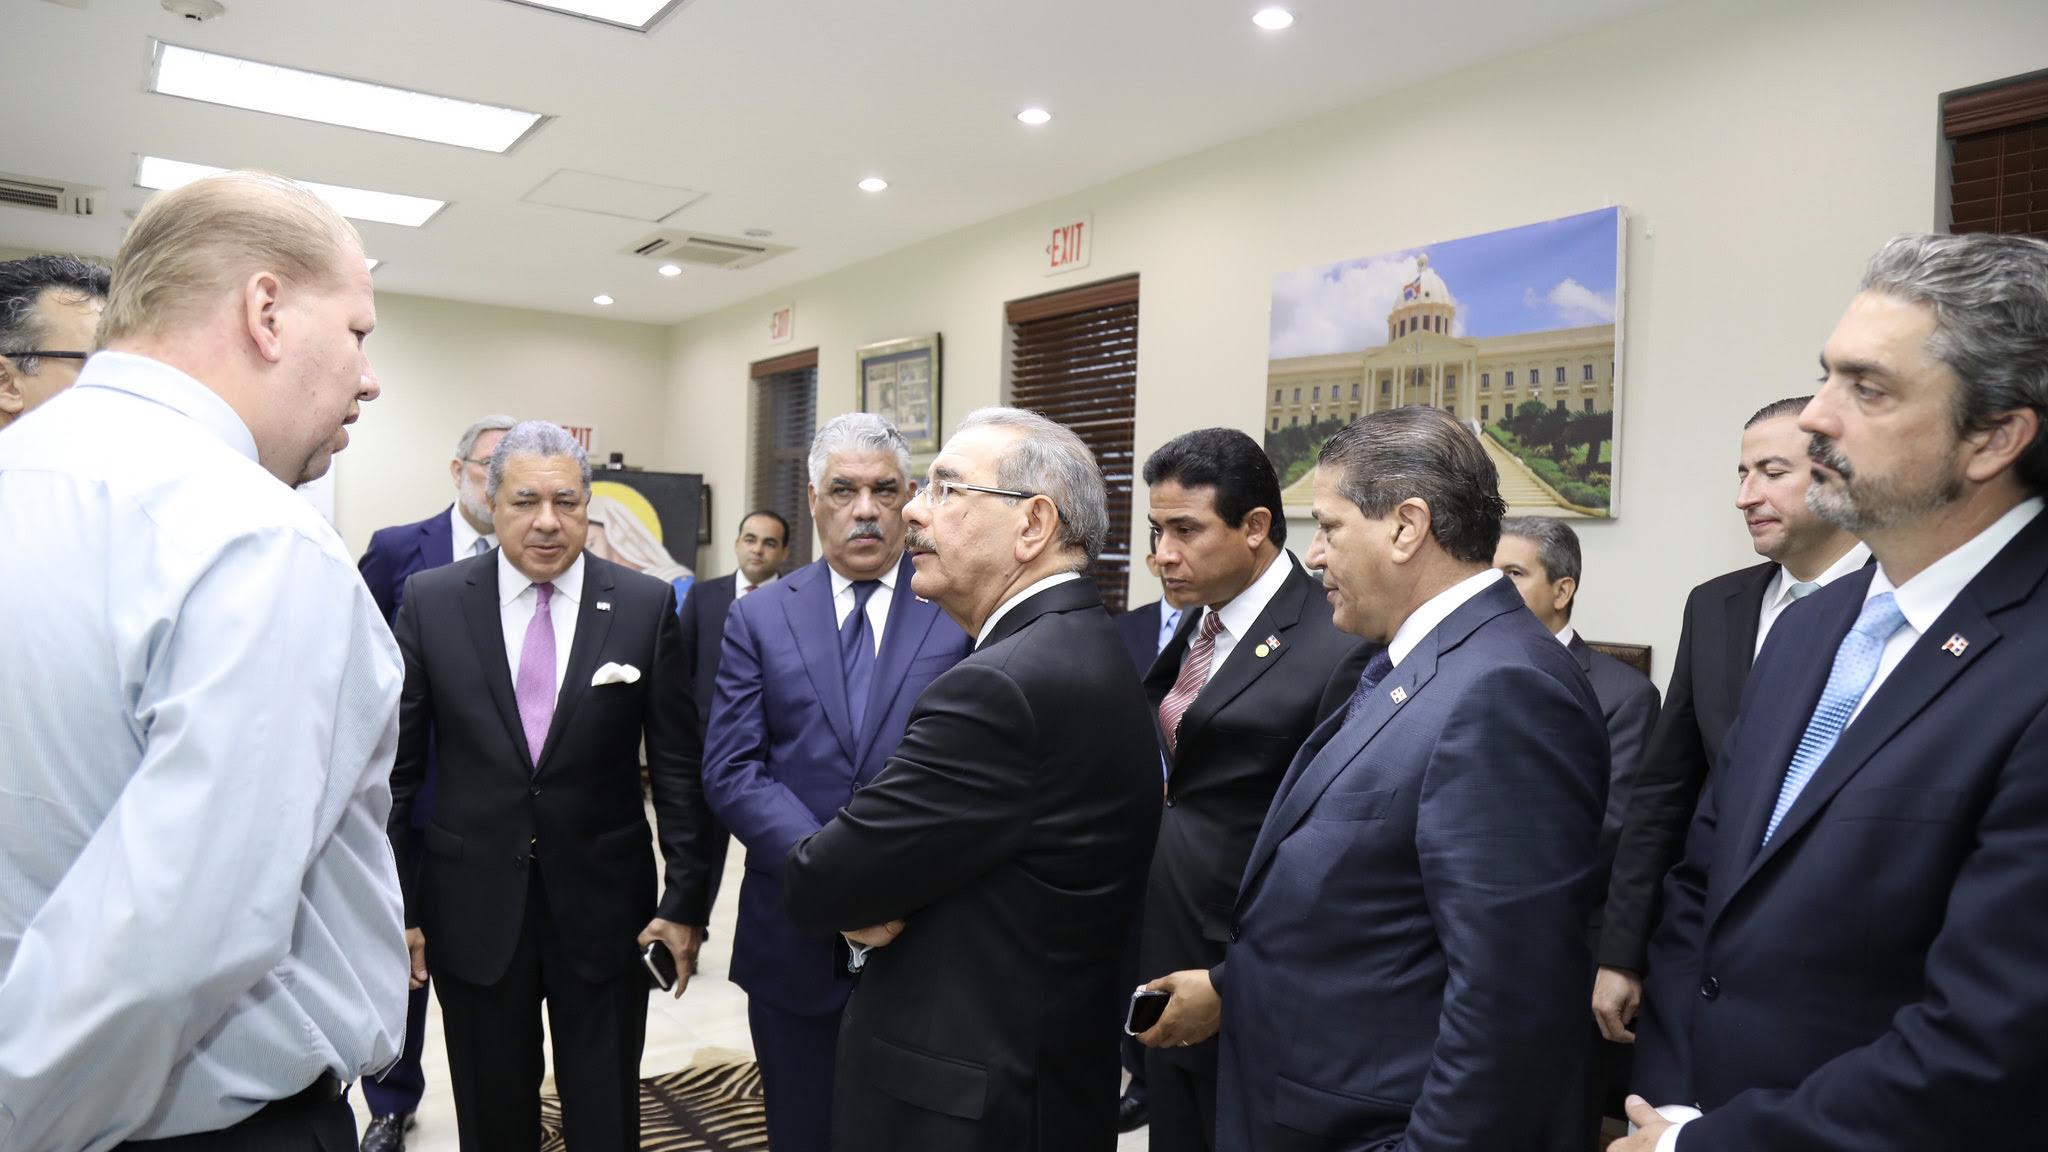 , Danilo se reúne con empresarios dominicanos en Jamaica. Agenda continúa este martes en Montego Bay